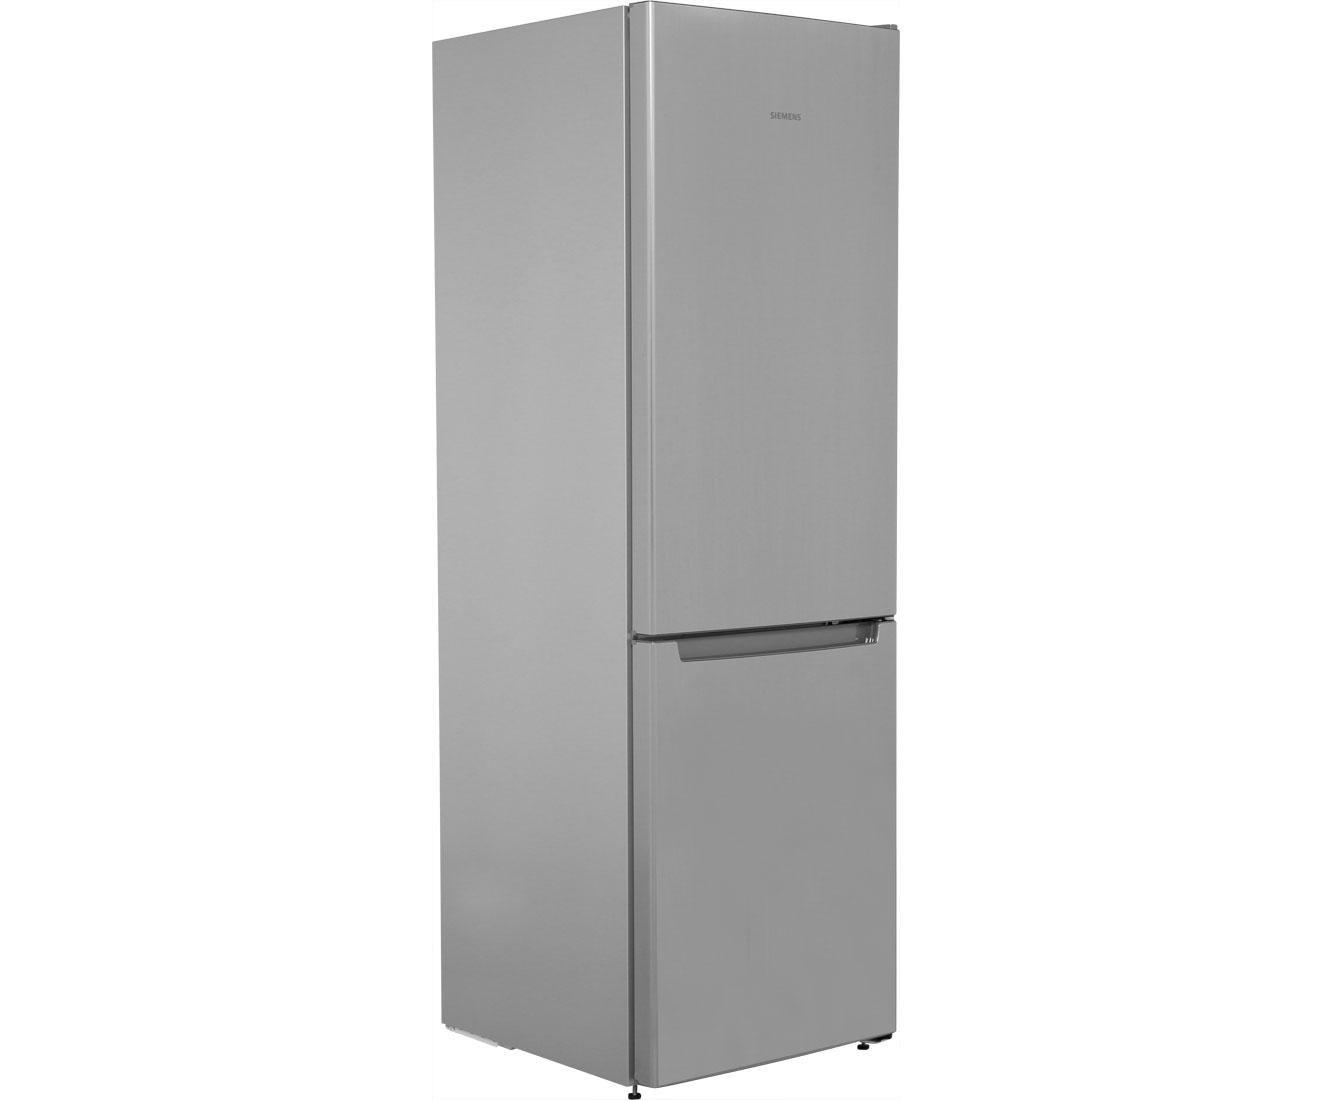 Kühlschrank Kombi : Siemens iq kg nnl kühl gefrierkombination mit no frost